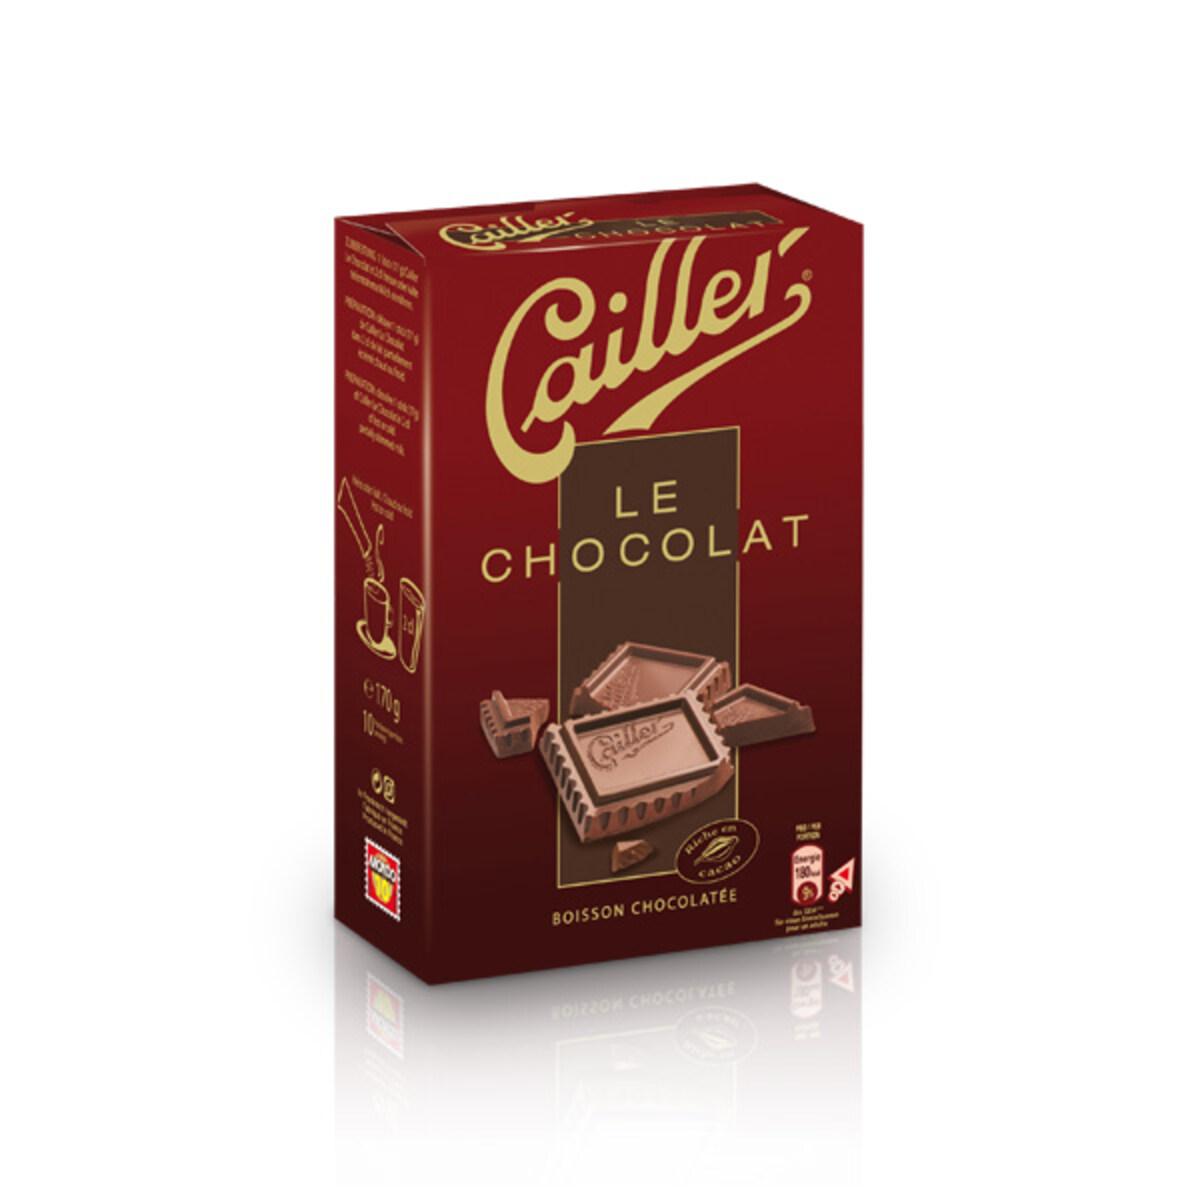 Неспресо течен шоколад - Cailler le chocolat